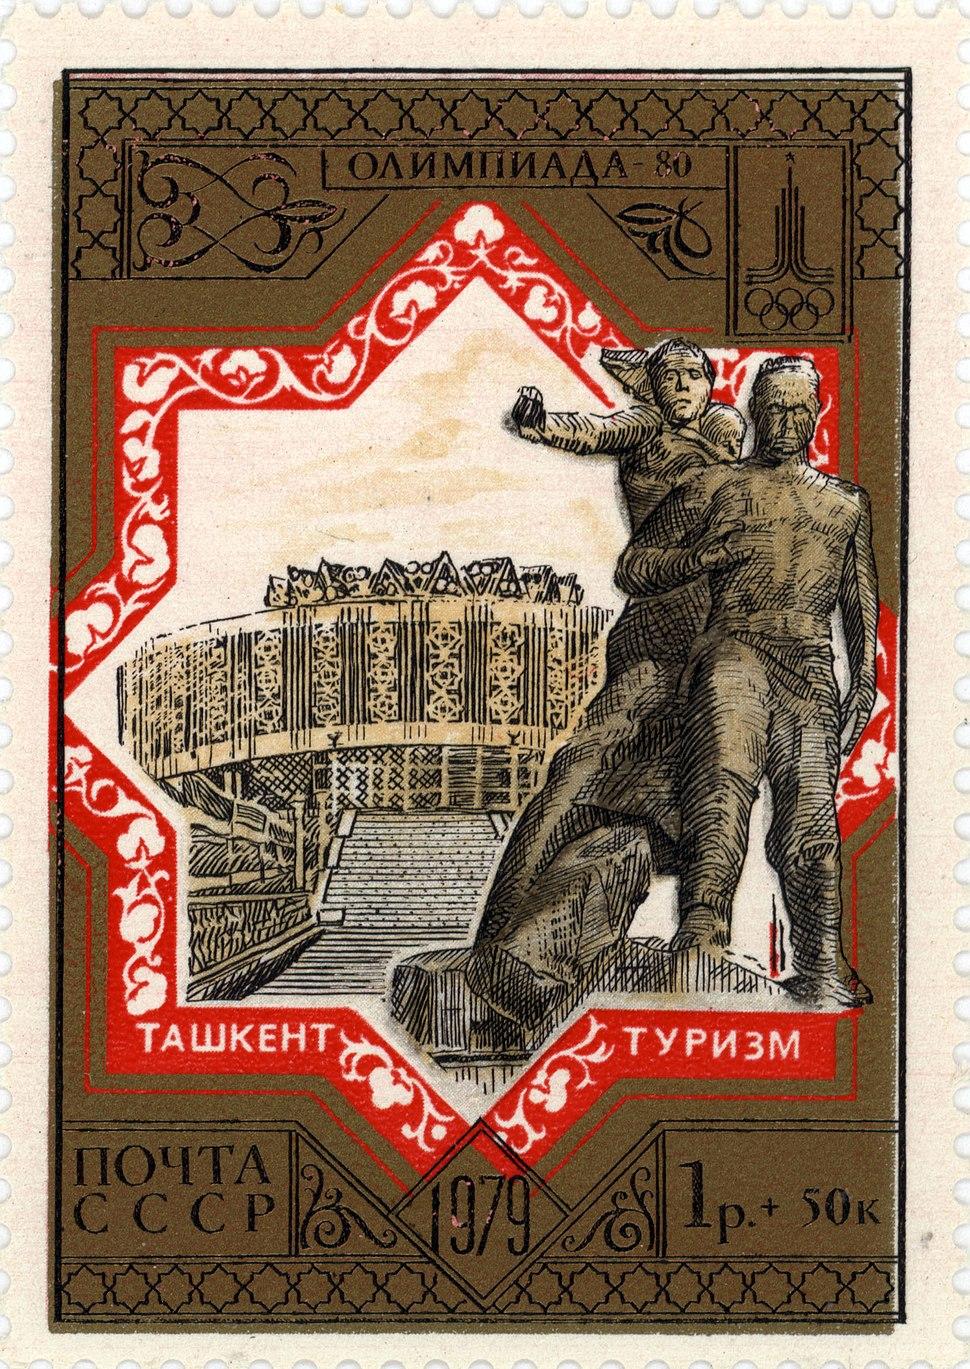 Tashkent. Courage monument. USSR stamp. 1979